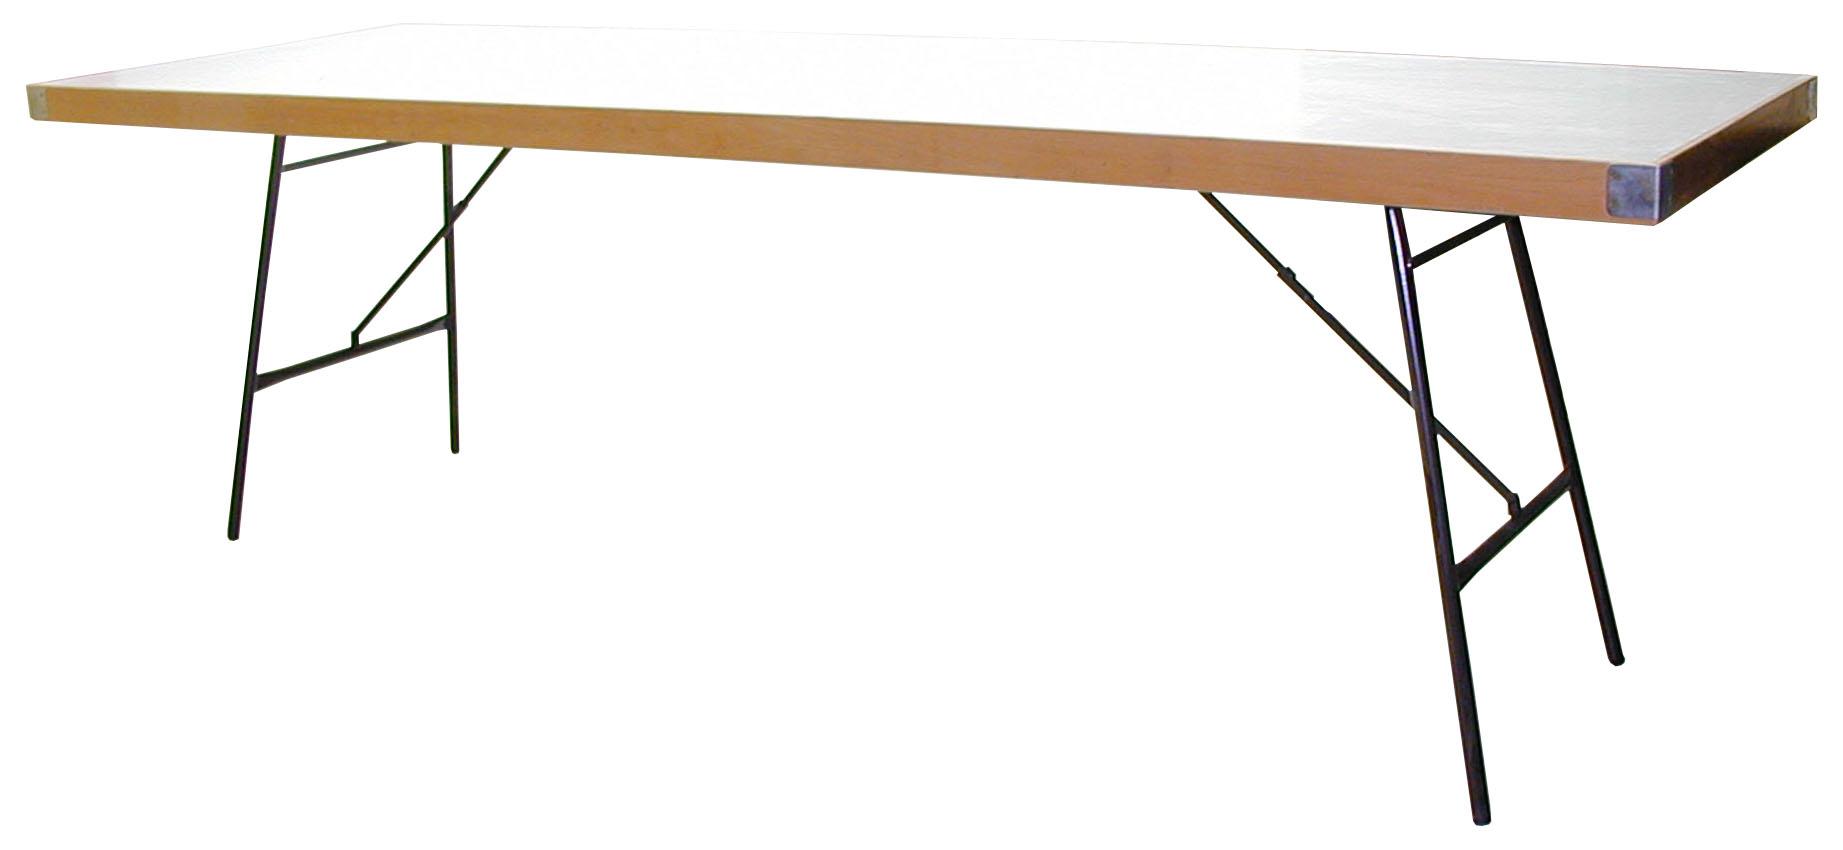 Mesa plegable madera patas abatibles banquetes 200x80 for Patas de mesa plegables